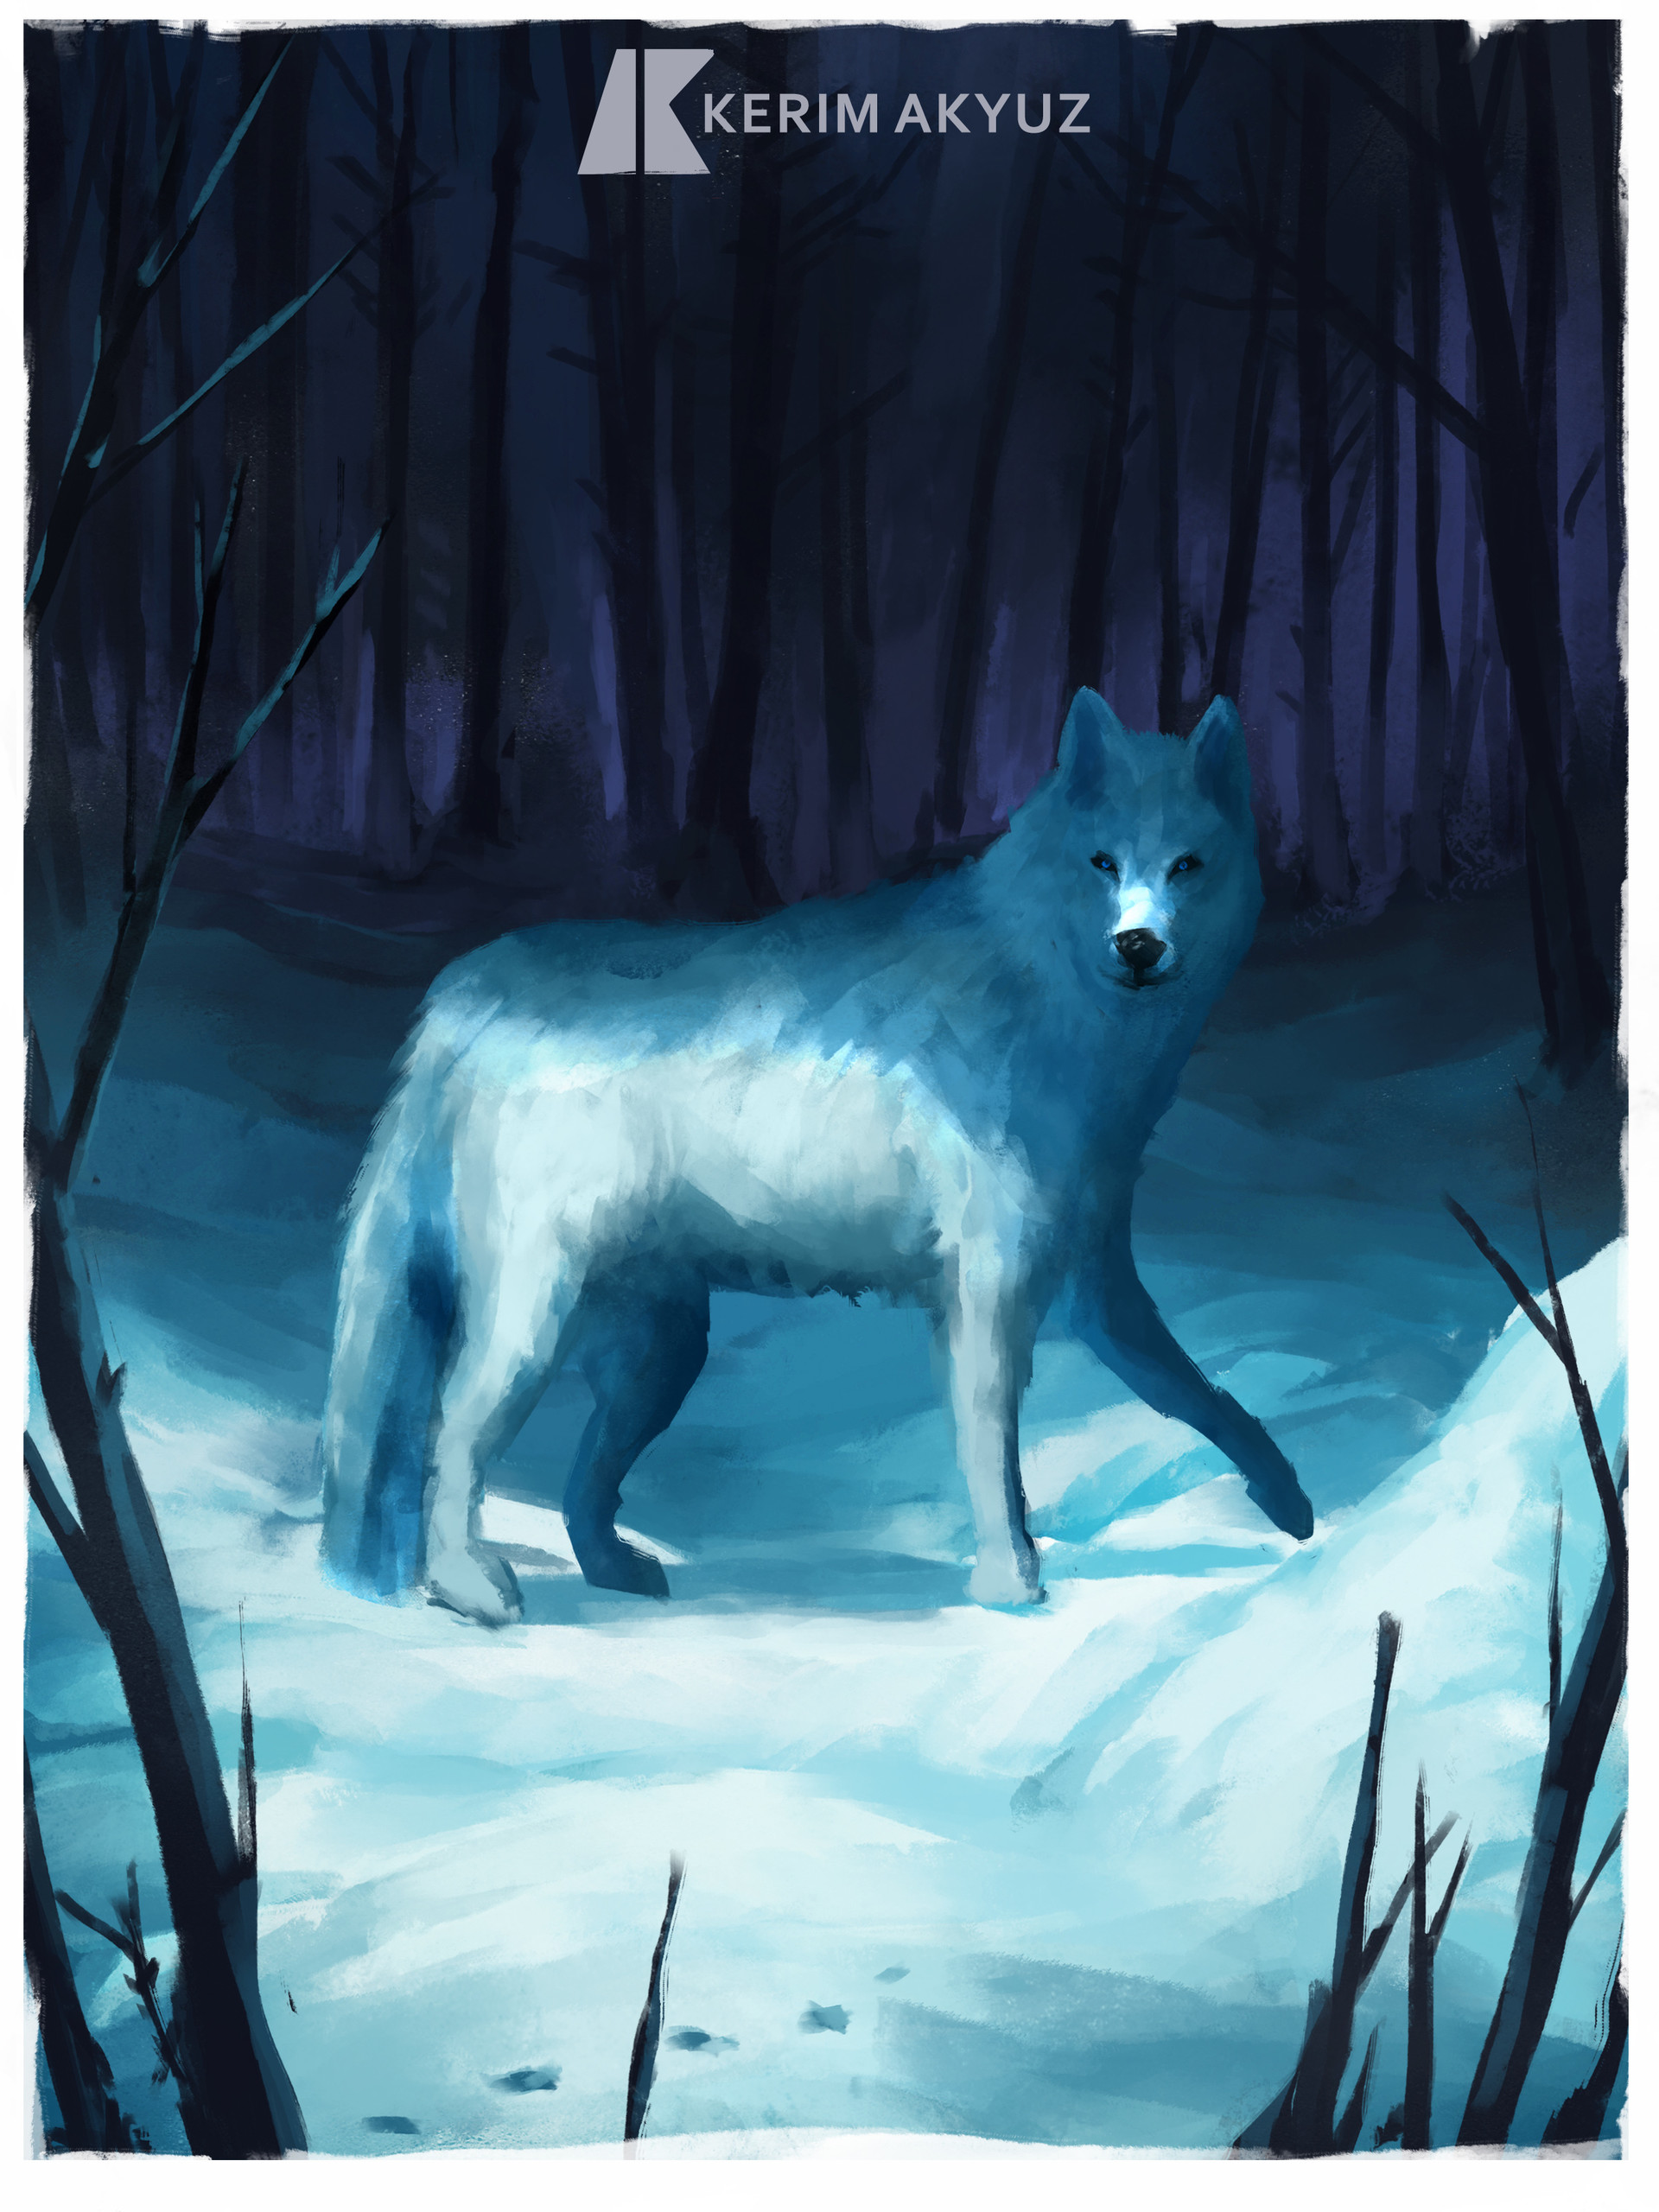 Kerim akyuz 99 snowwolf